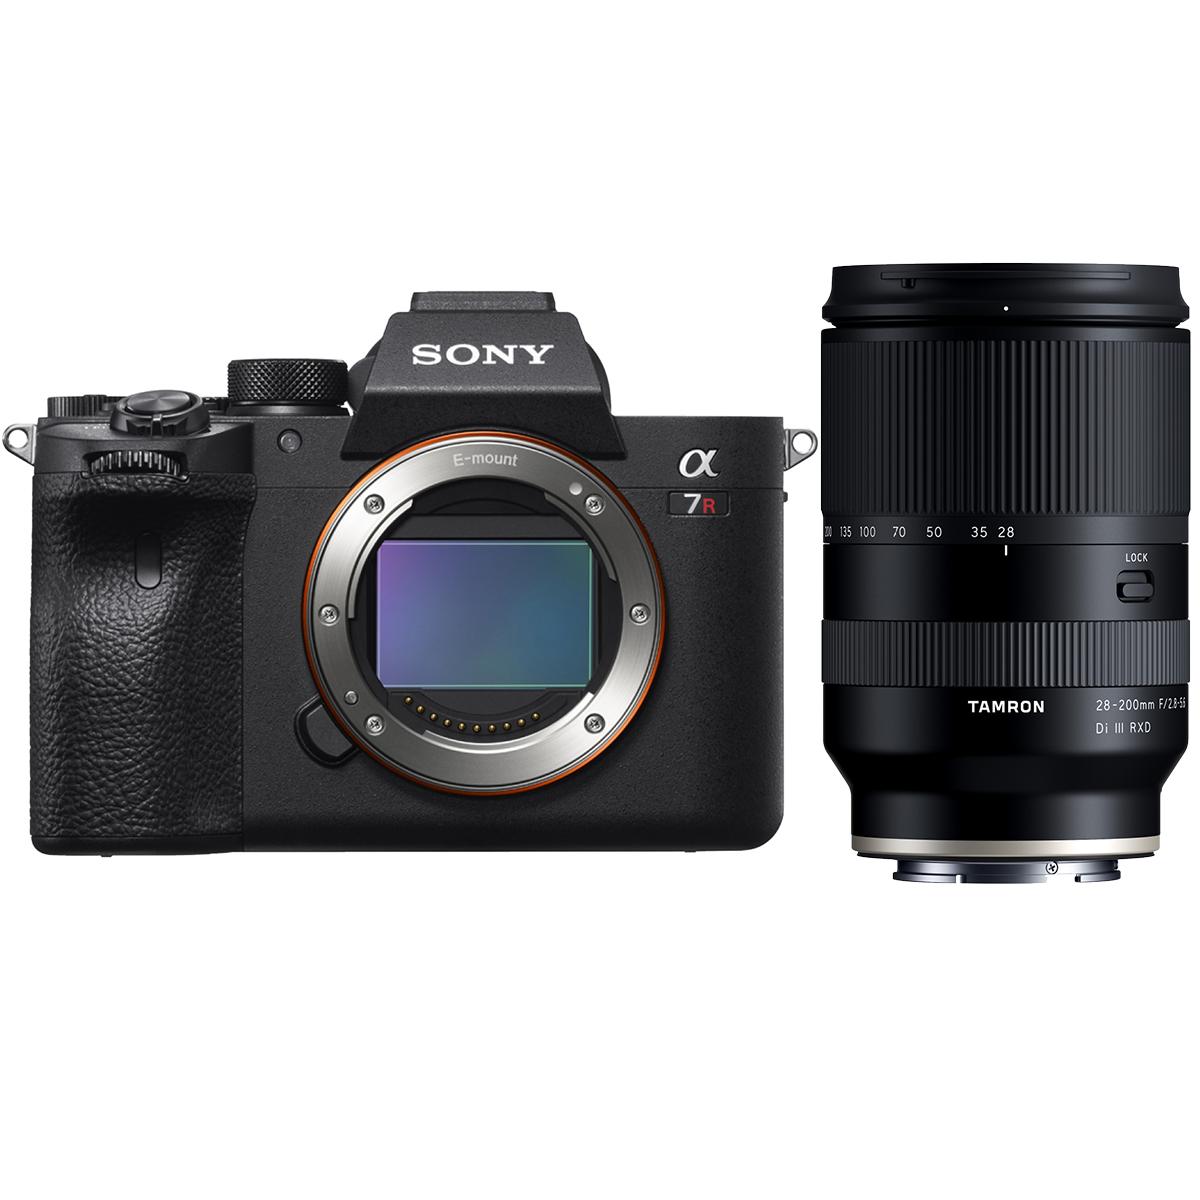 Sony Alpha 7R III A + Tamron 28-200 mm 1:2,8-5,6 Di III RXD